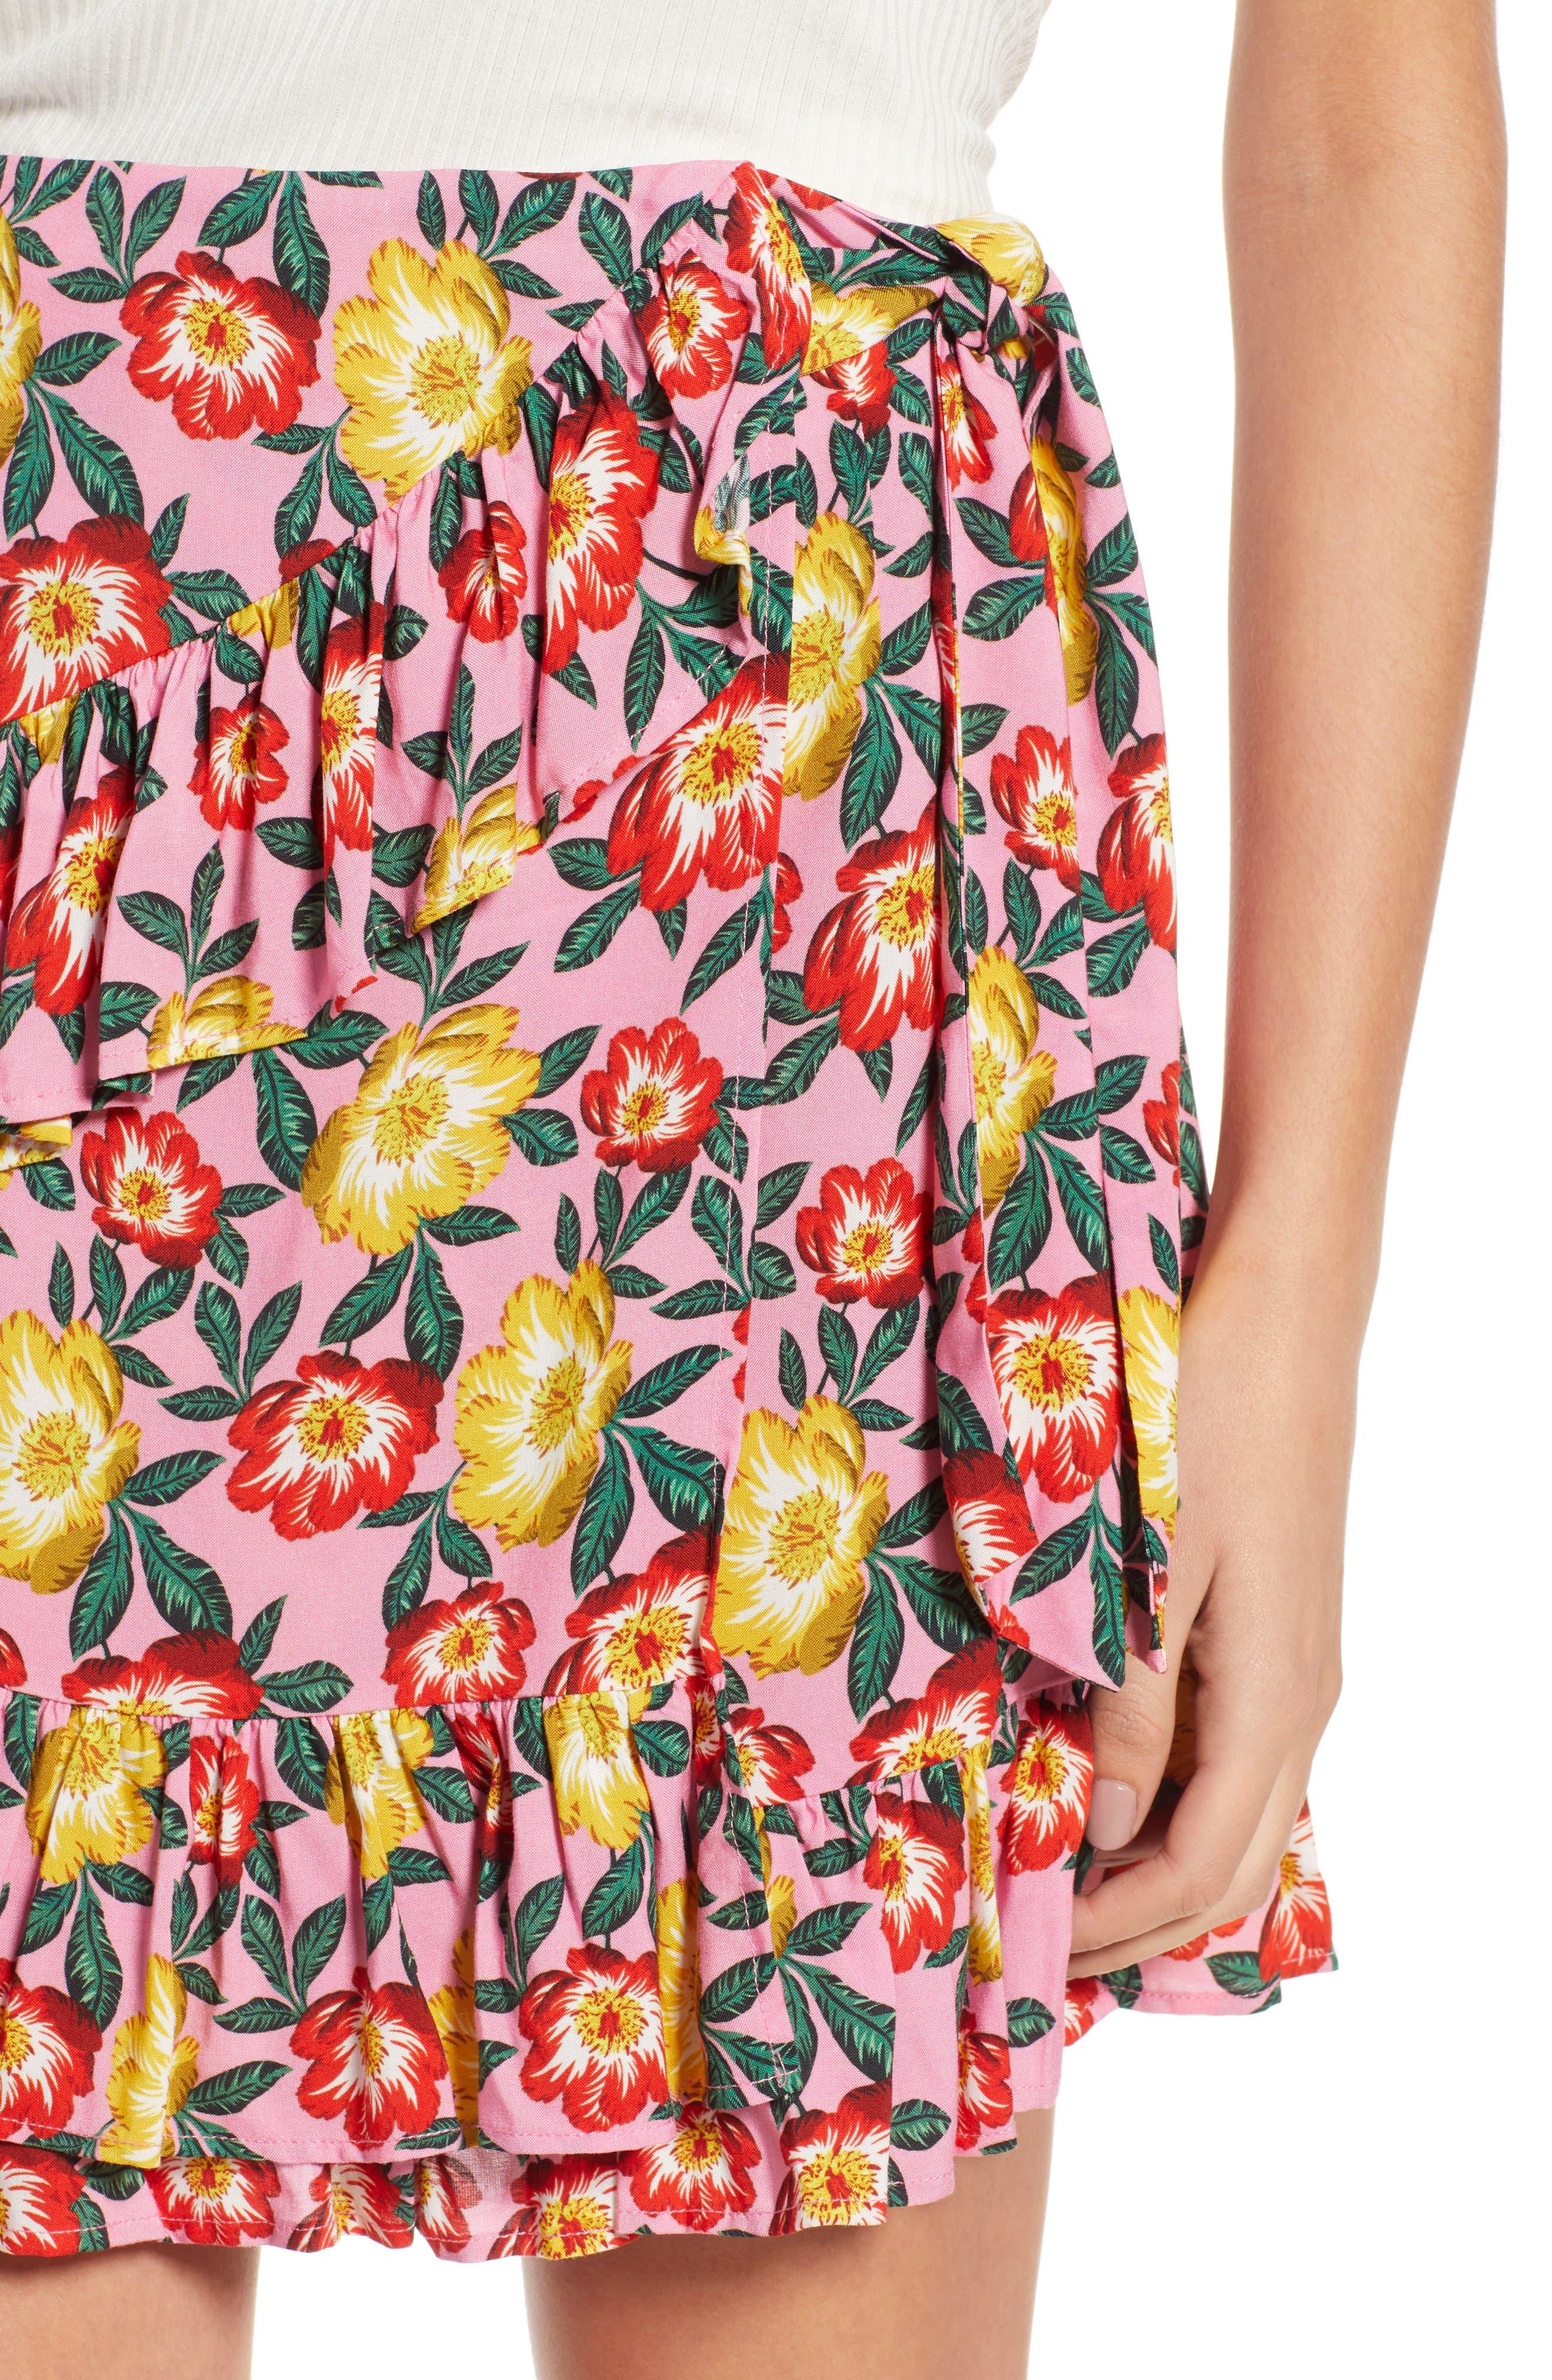 Reunion Floral Print Wrap Skirt,                             Alternate thumbnail 4, color,                             650